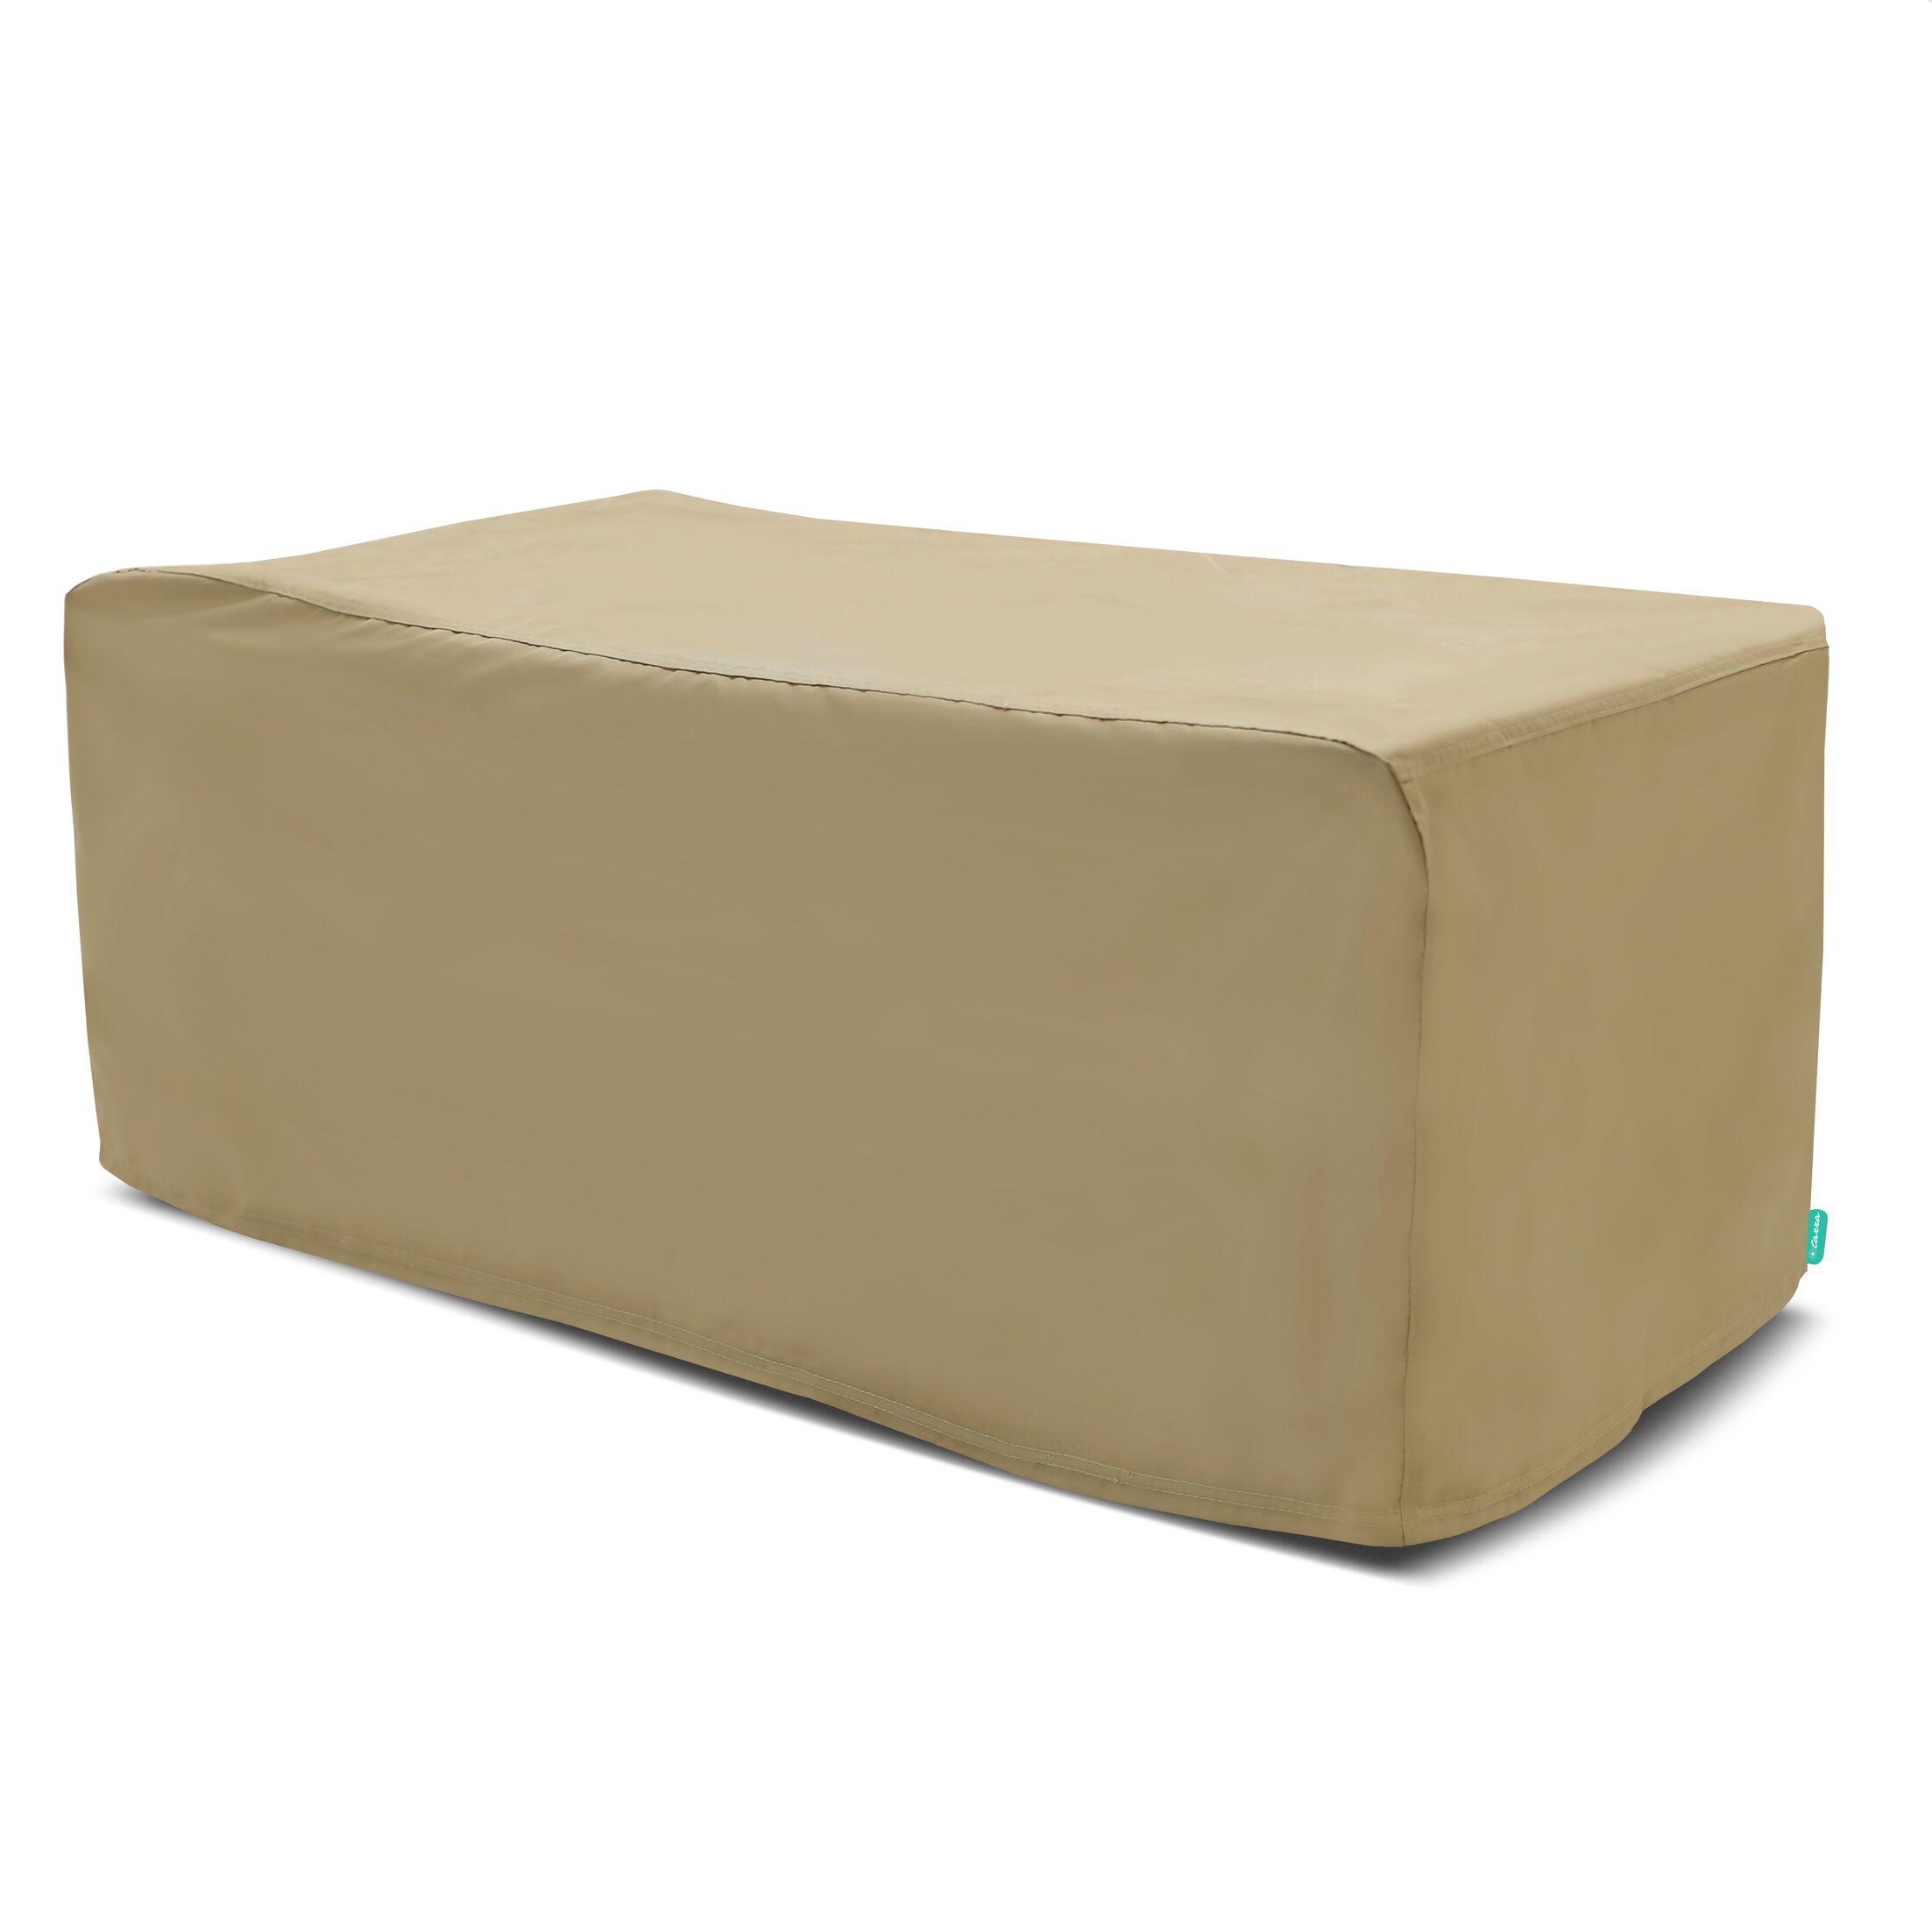 Outdoor Square Patio Table Cover Color: Presidium Tan, Size: 30